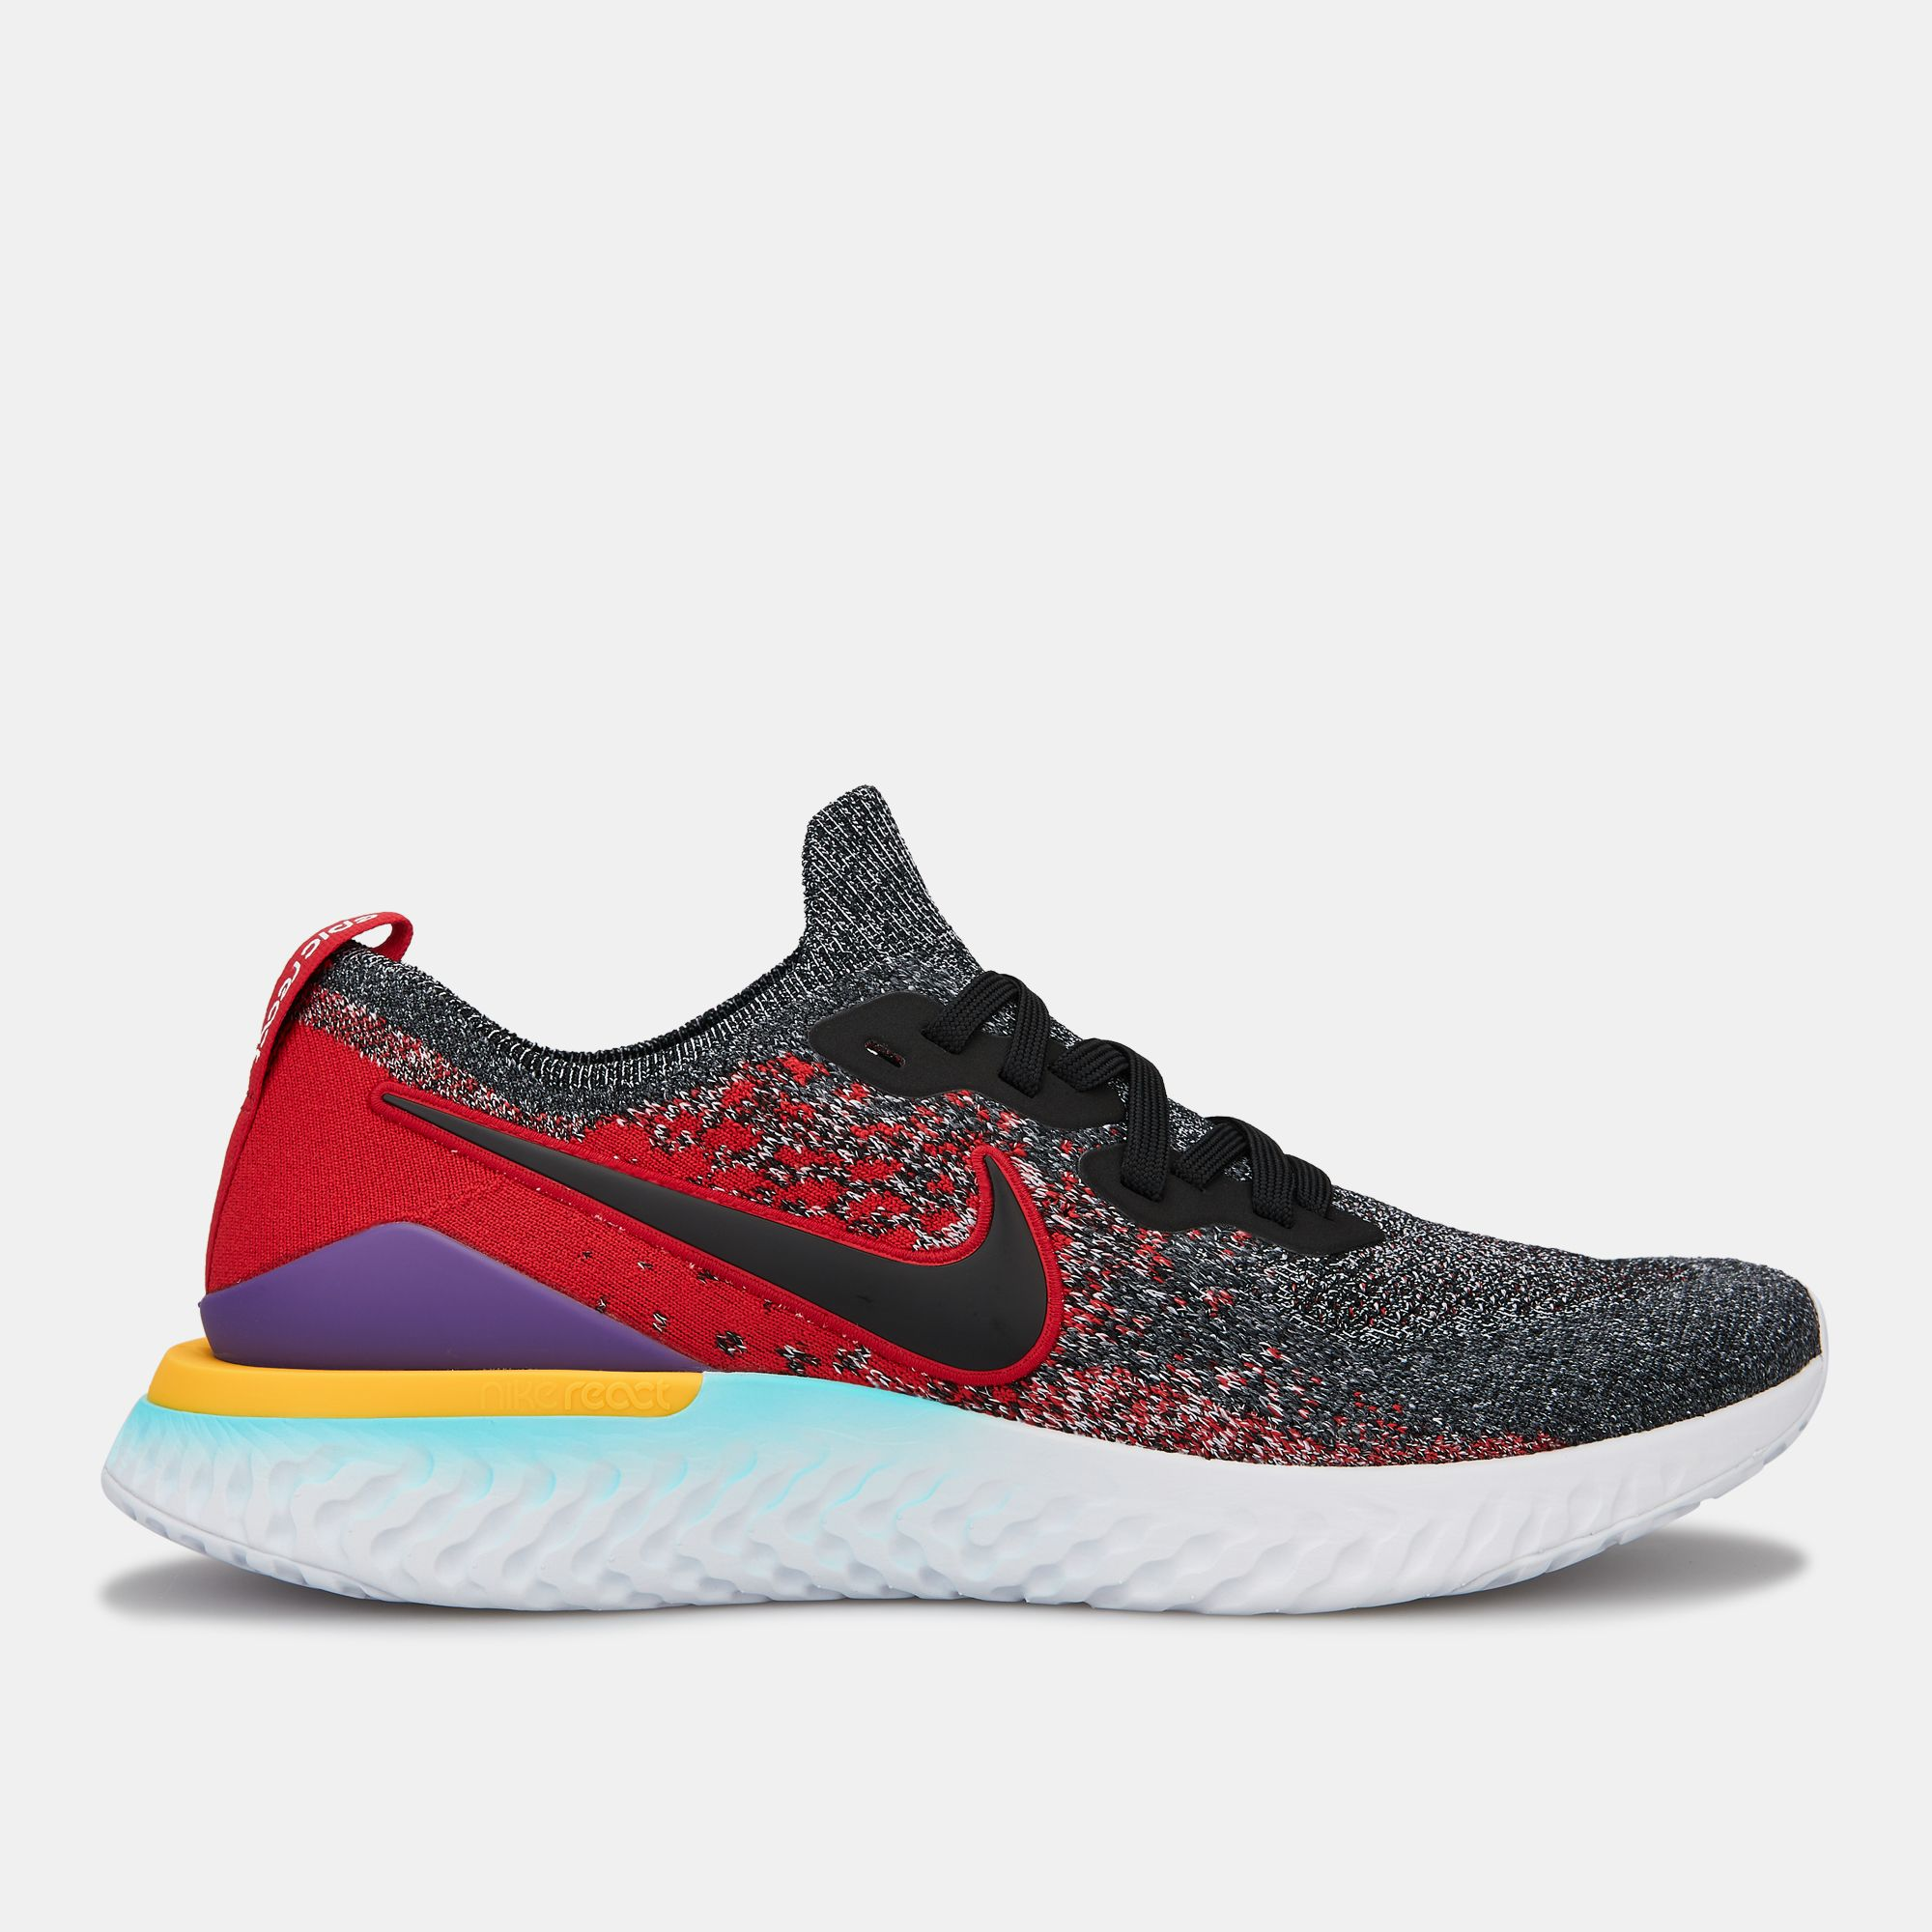 size 40 0bd2b 4b9d1 Nike Men s Epic React Flyknit 2 Shoe   Road Running   Running Shoes   Shoes    Mens   SSS